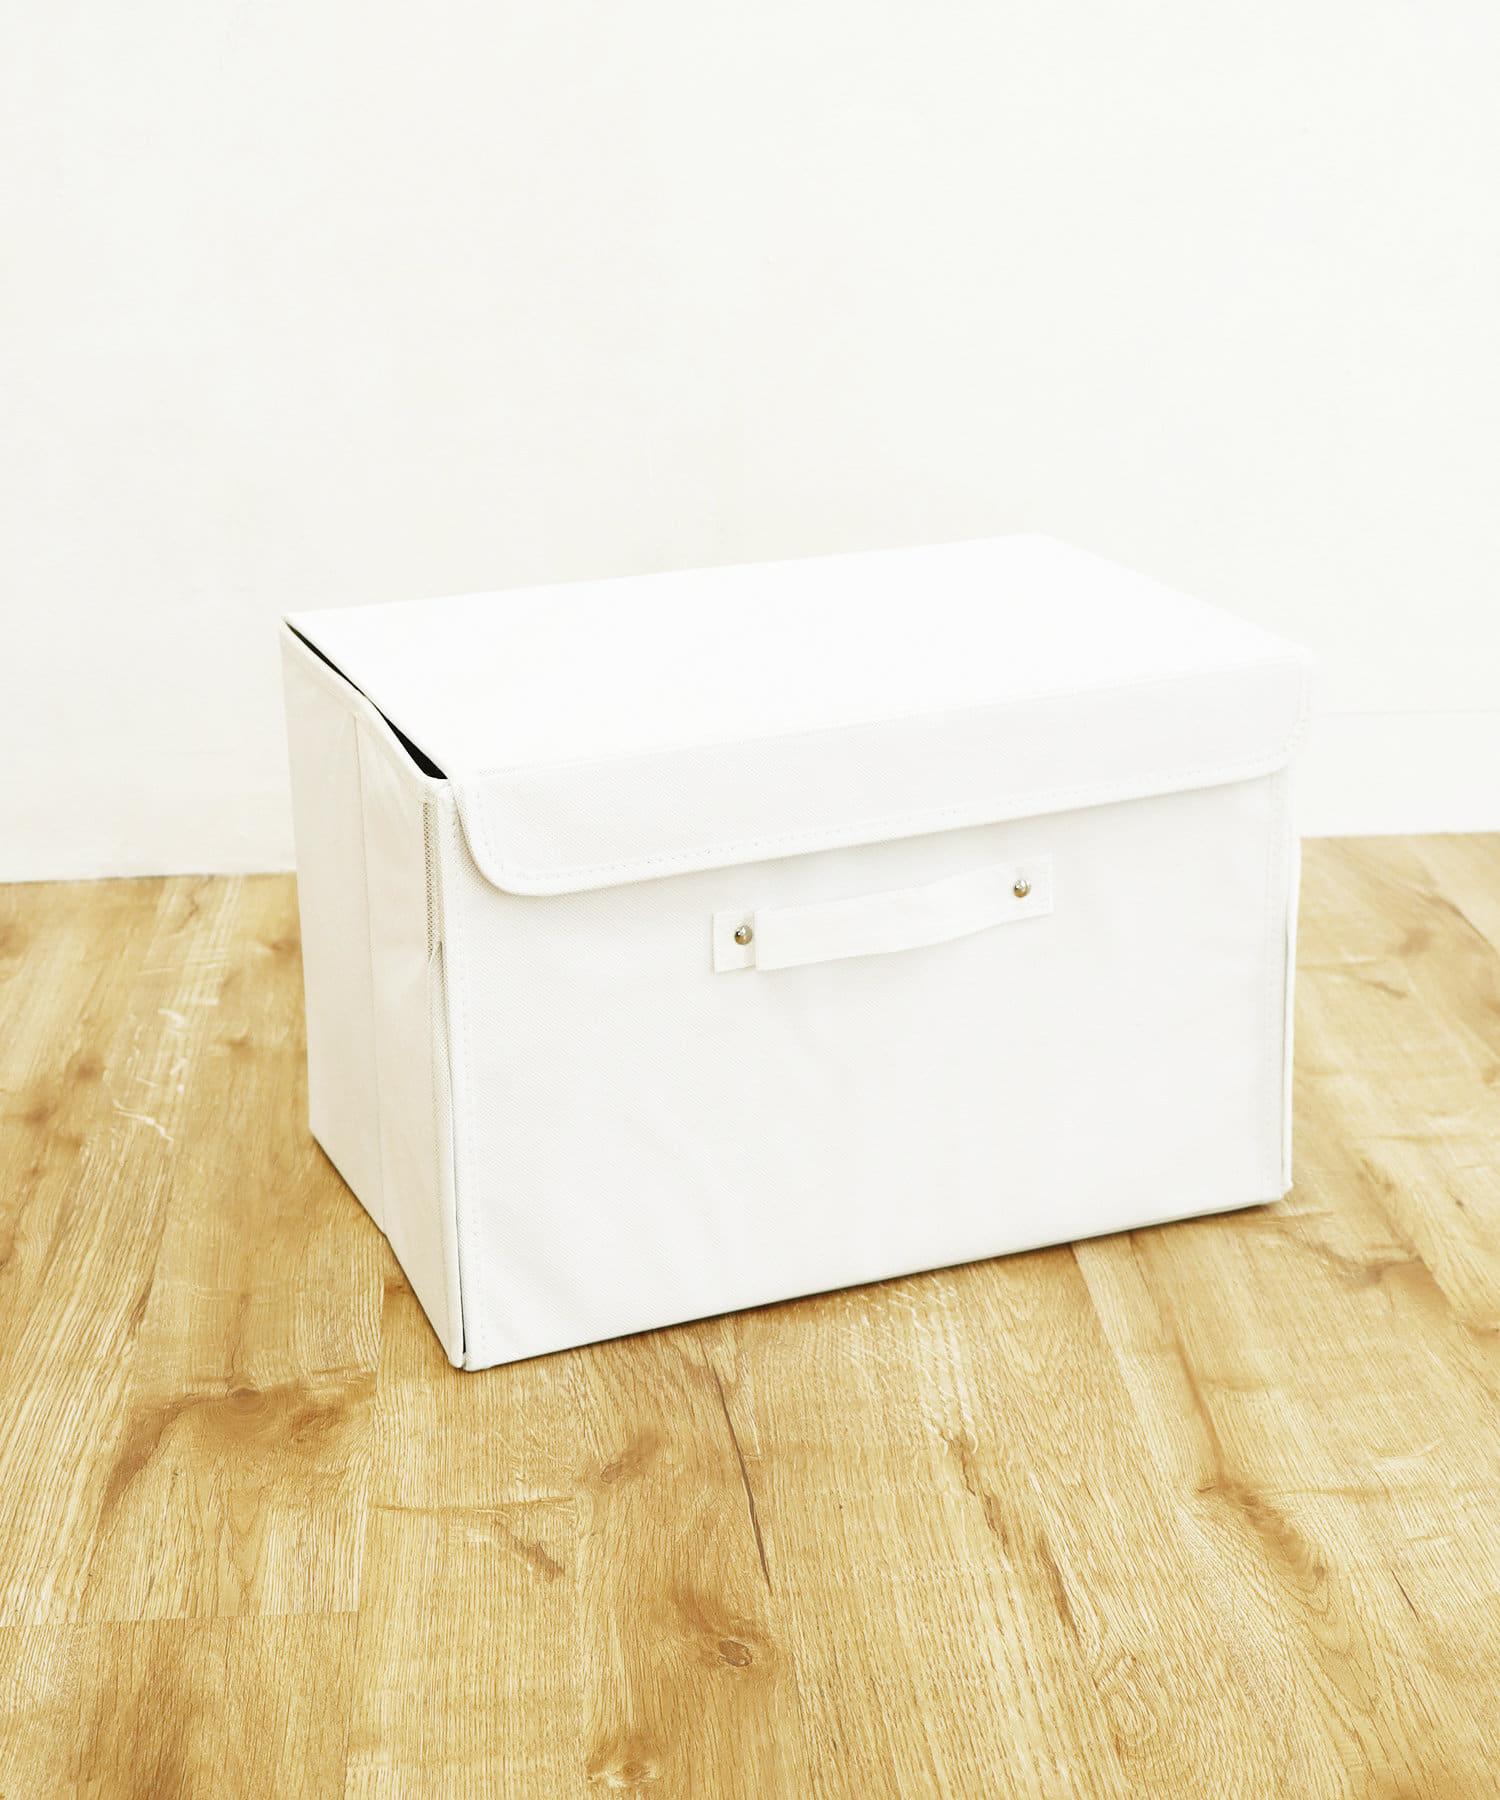 3COINS(スリーコインズ) ライフスタイル フタ付前開きワイドボックス ホワイト